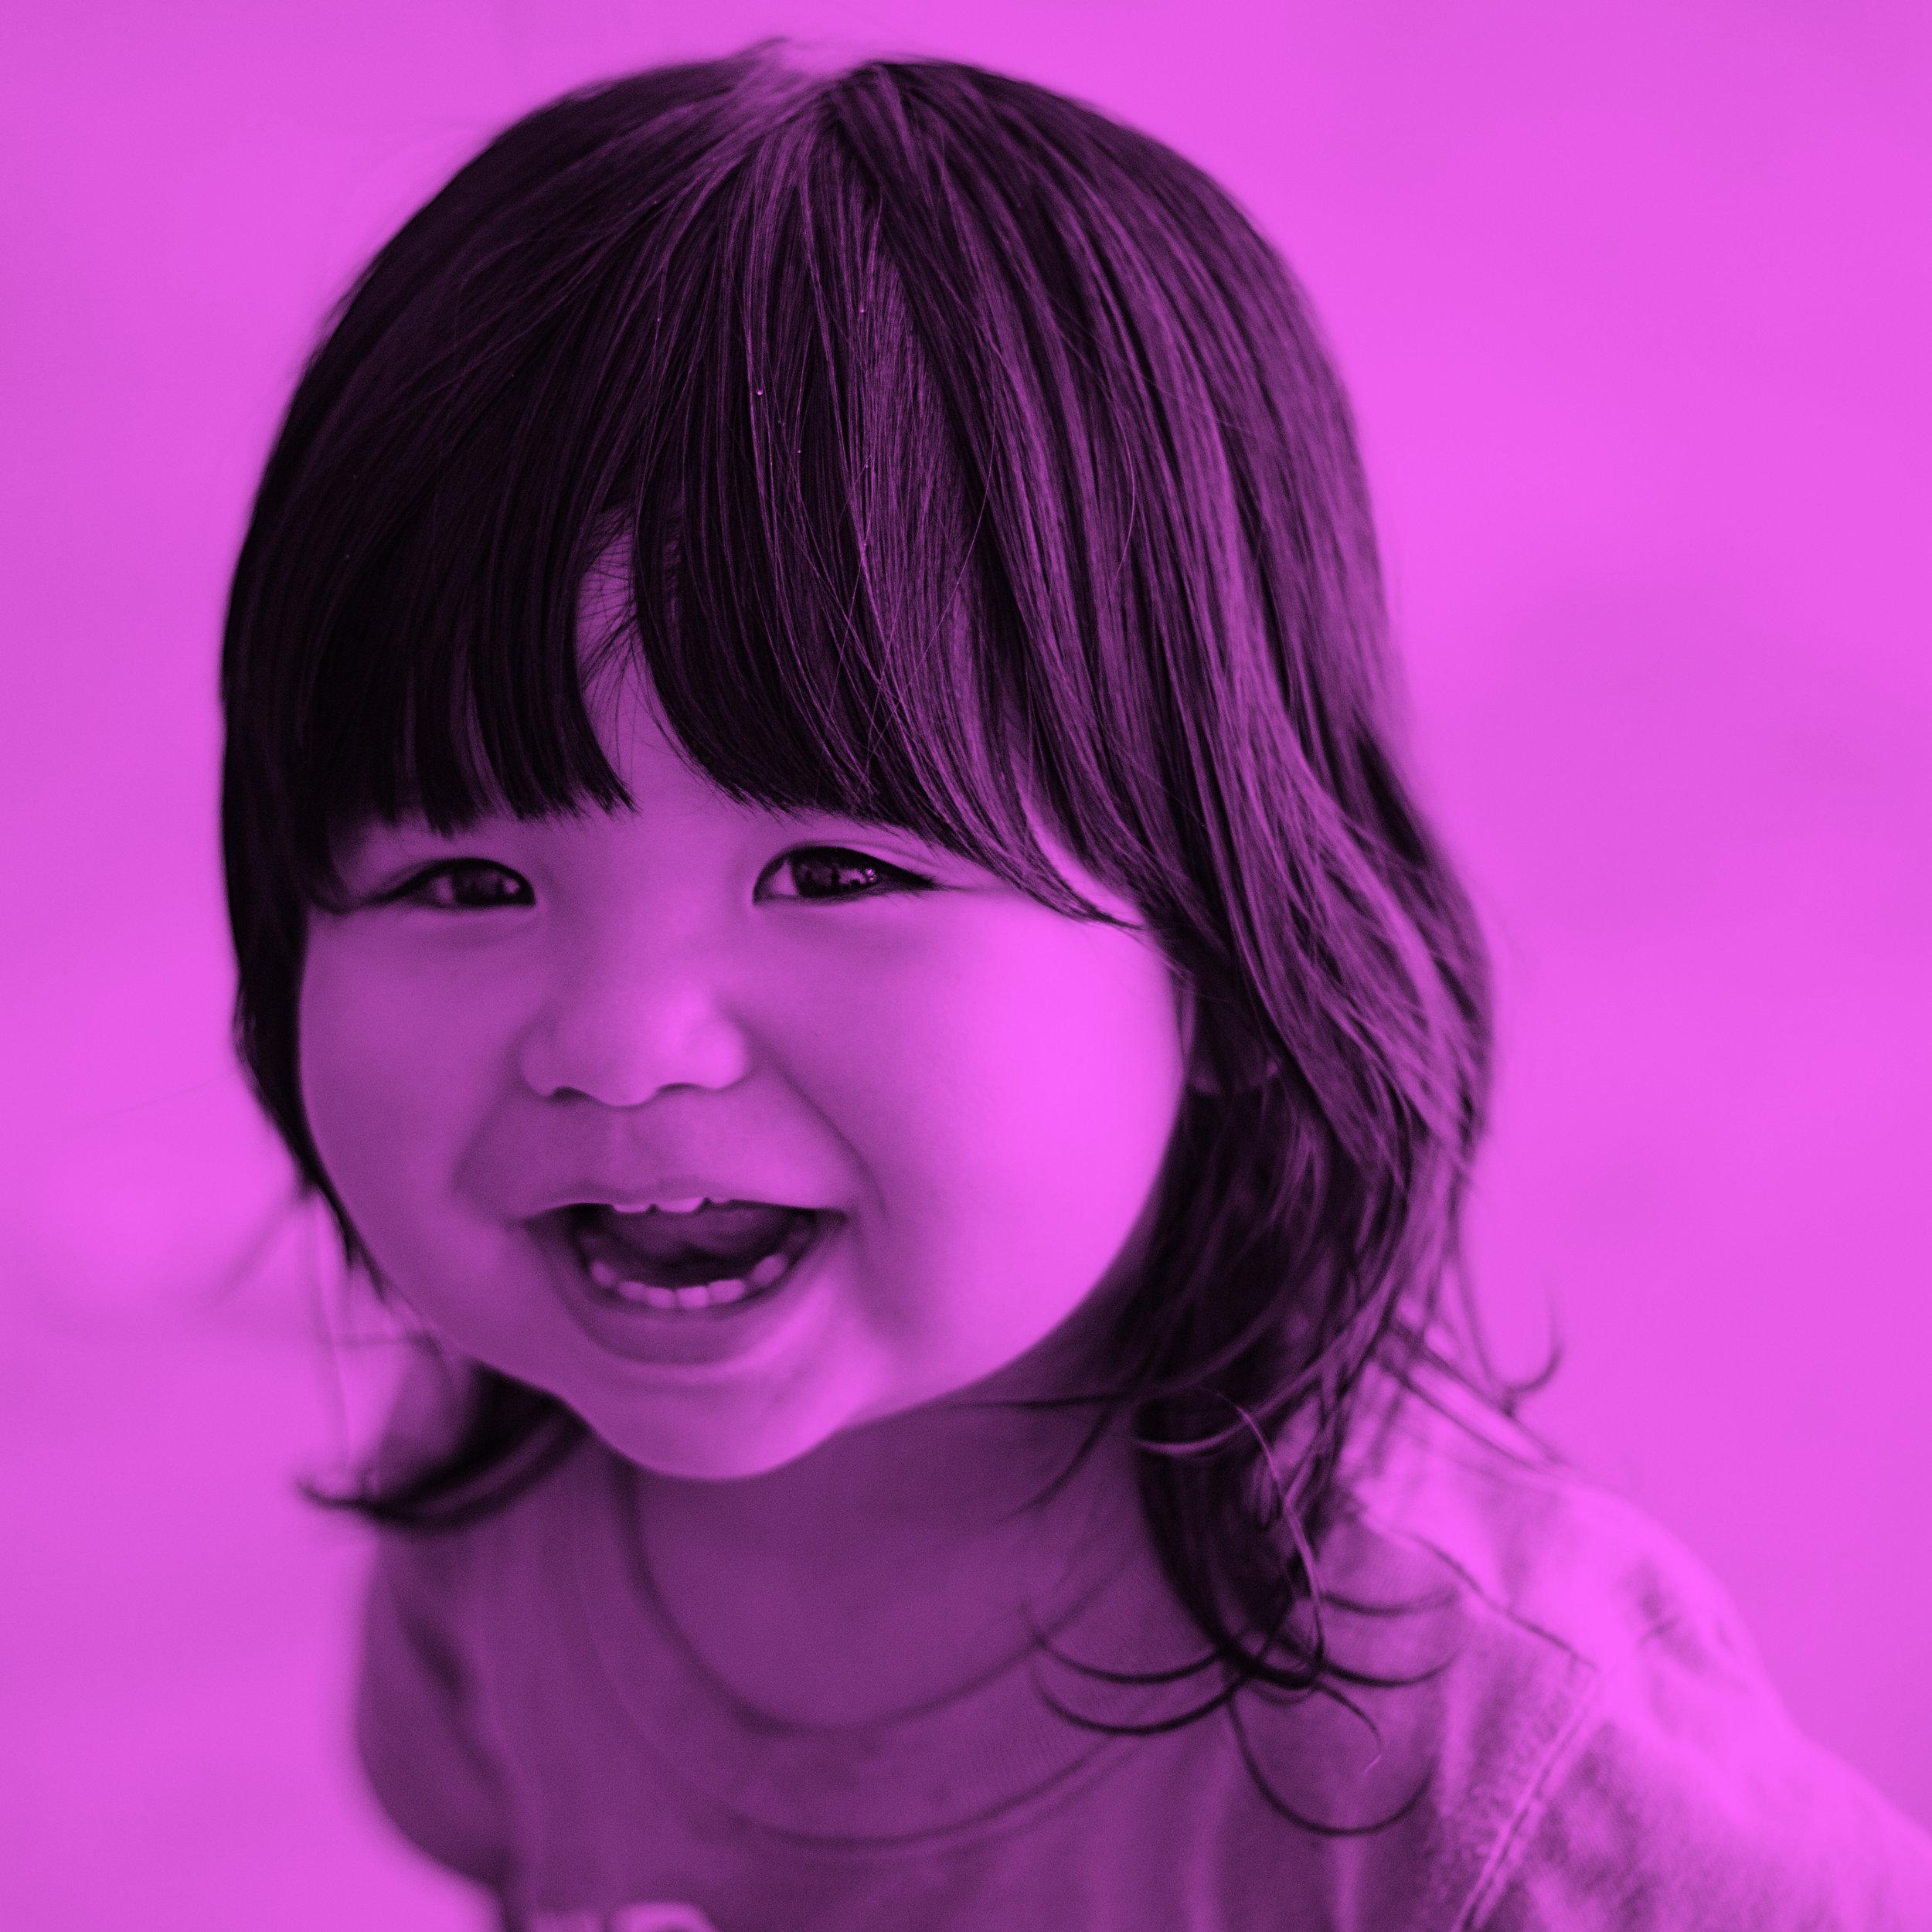 baby-2553539 pink.jpg